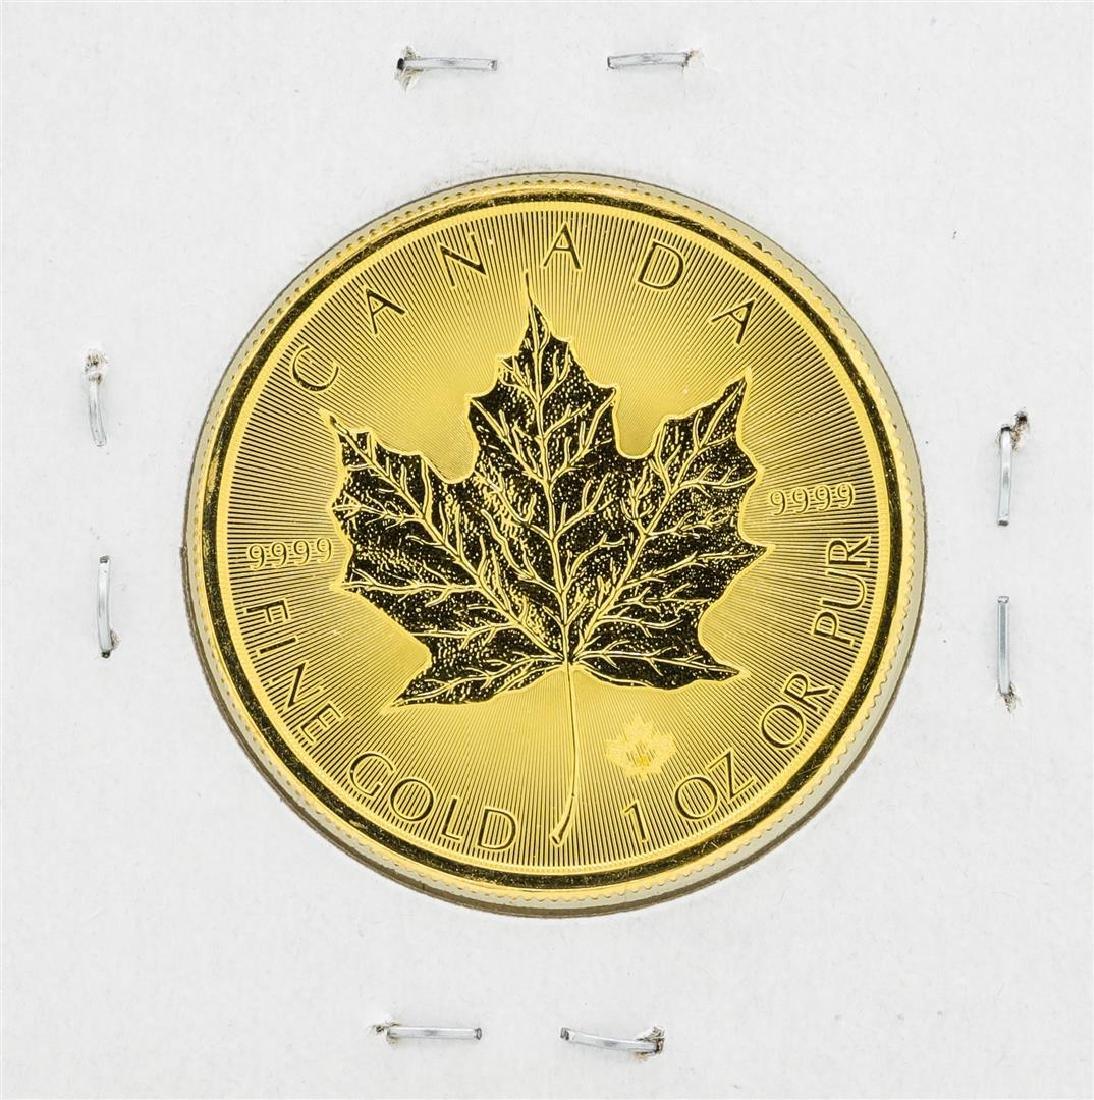 2016 Canadian $50 Gold Maple Leaf - 2